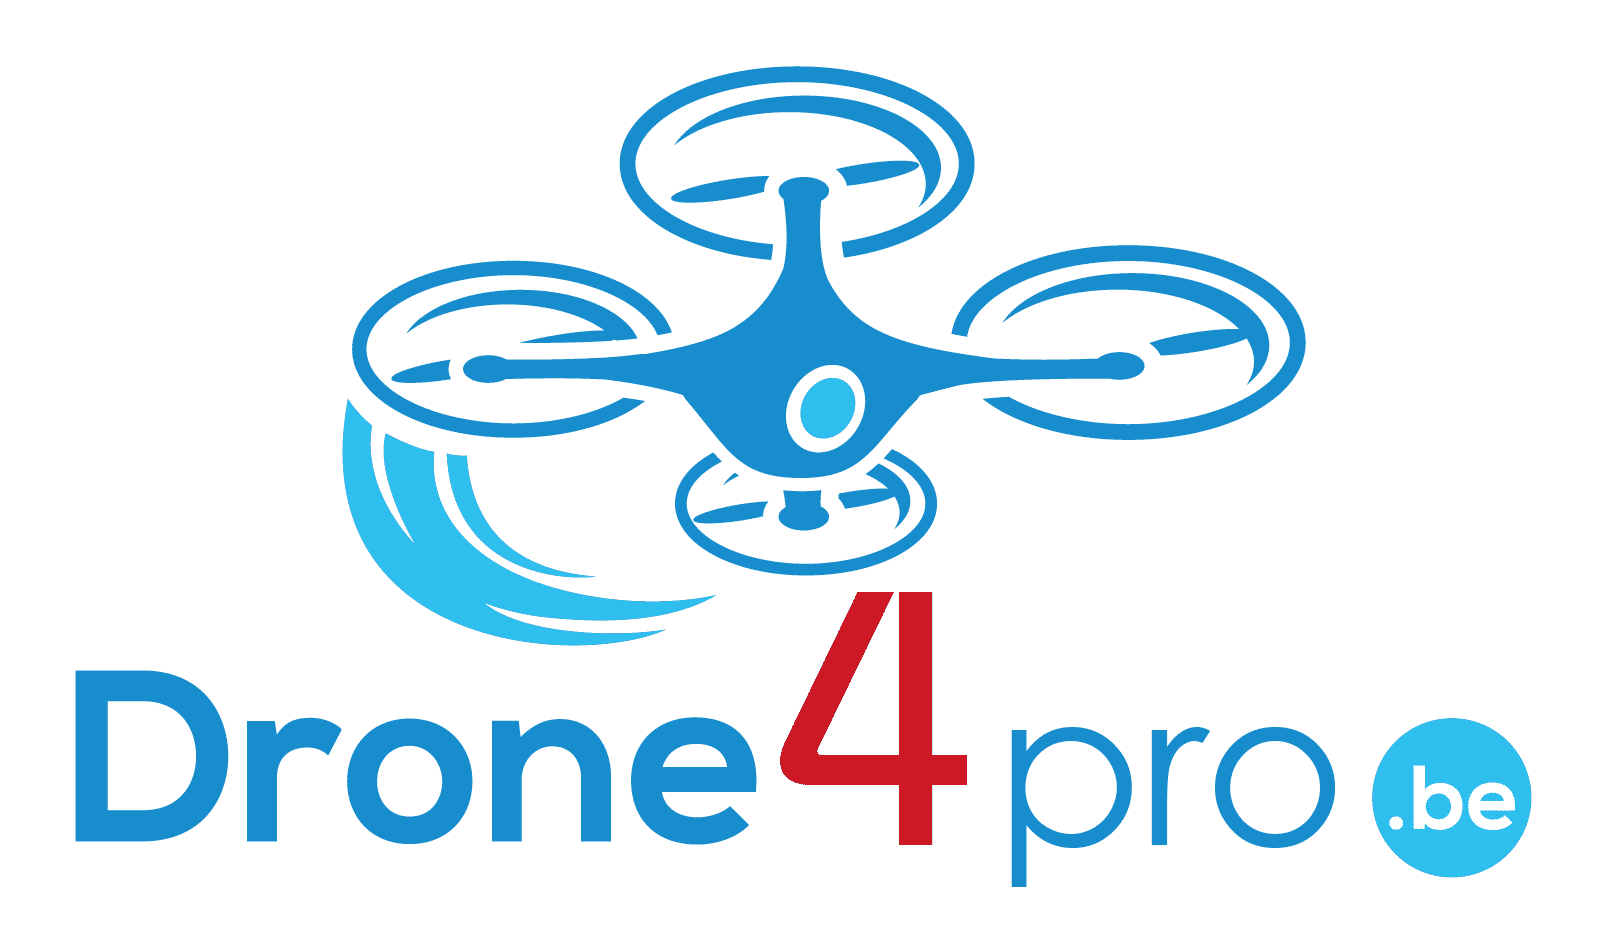 Drone4pro logo